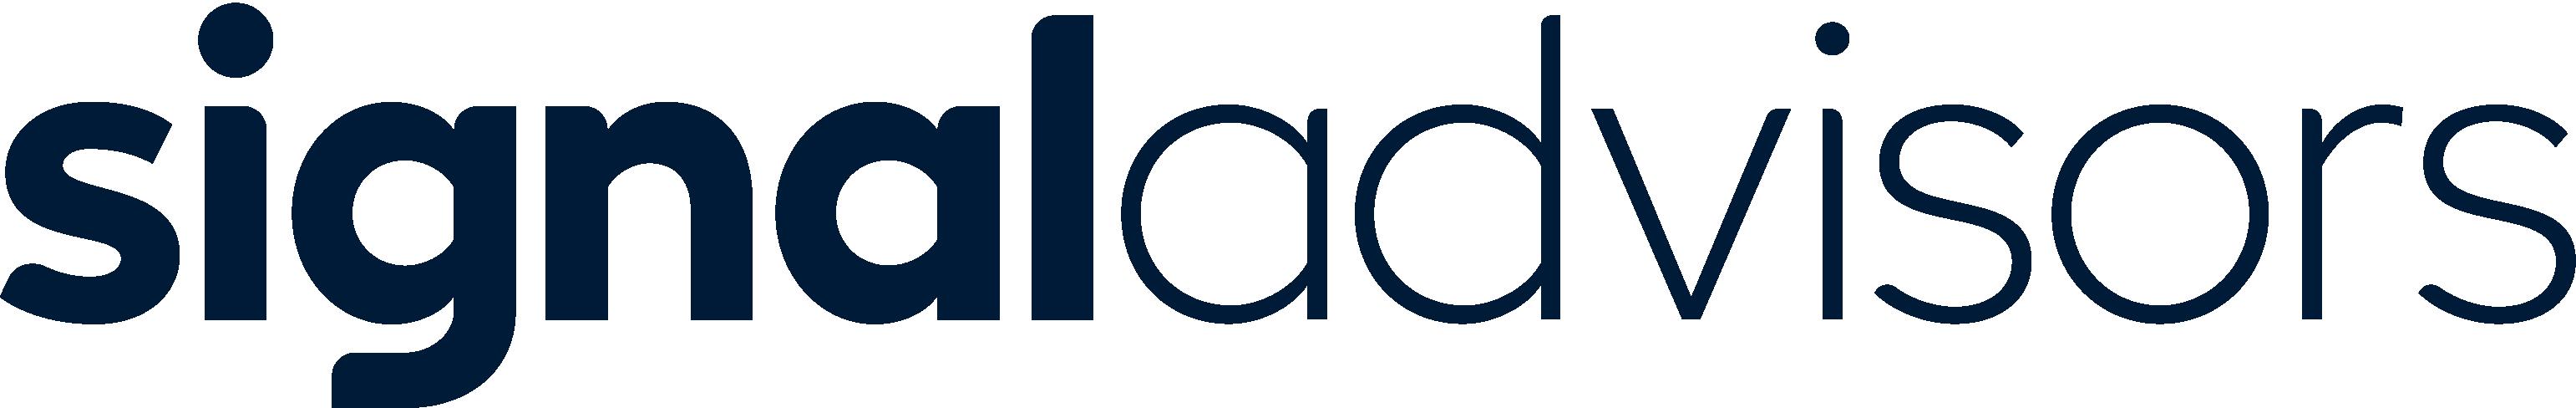 signal advisors logo